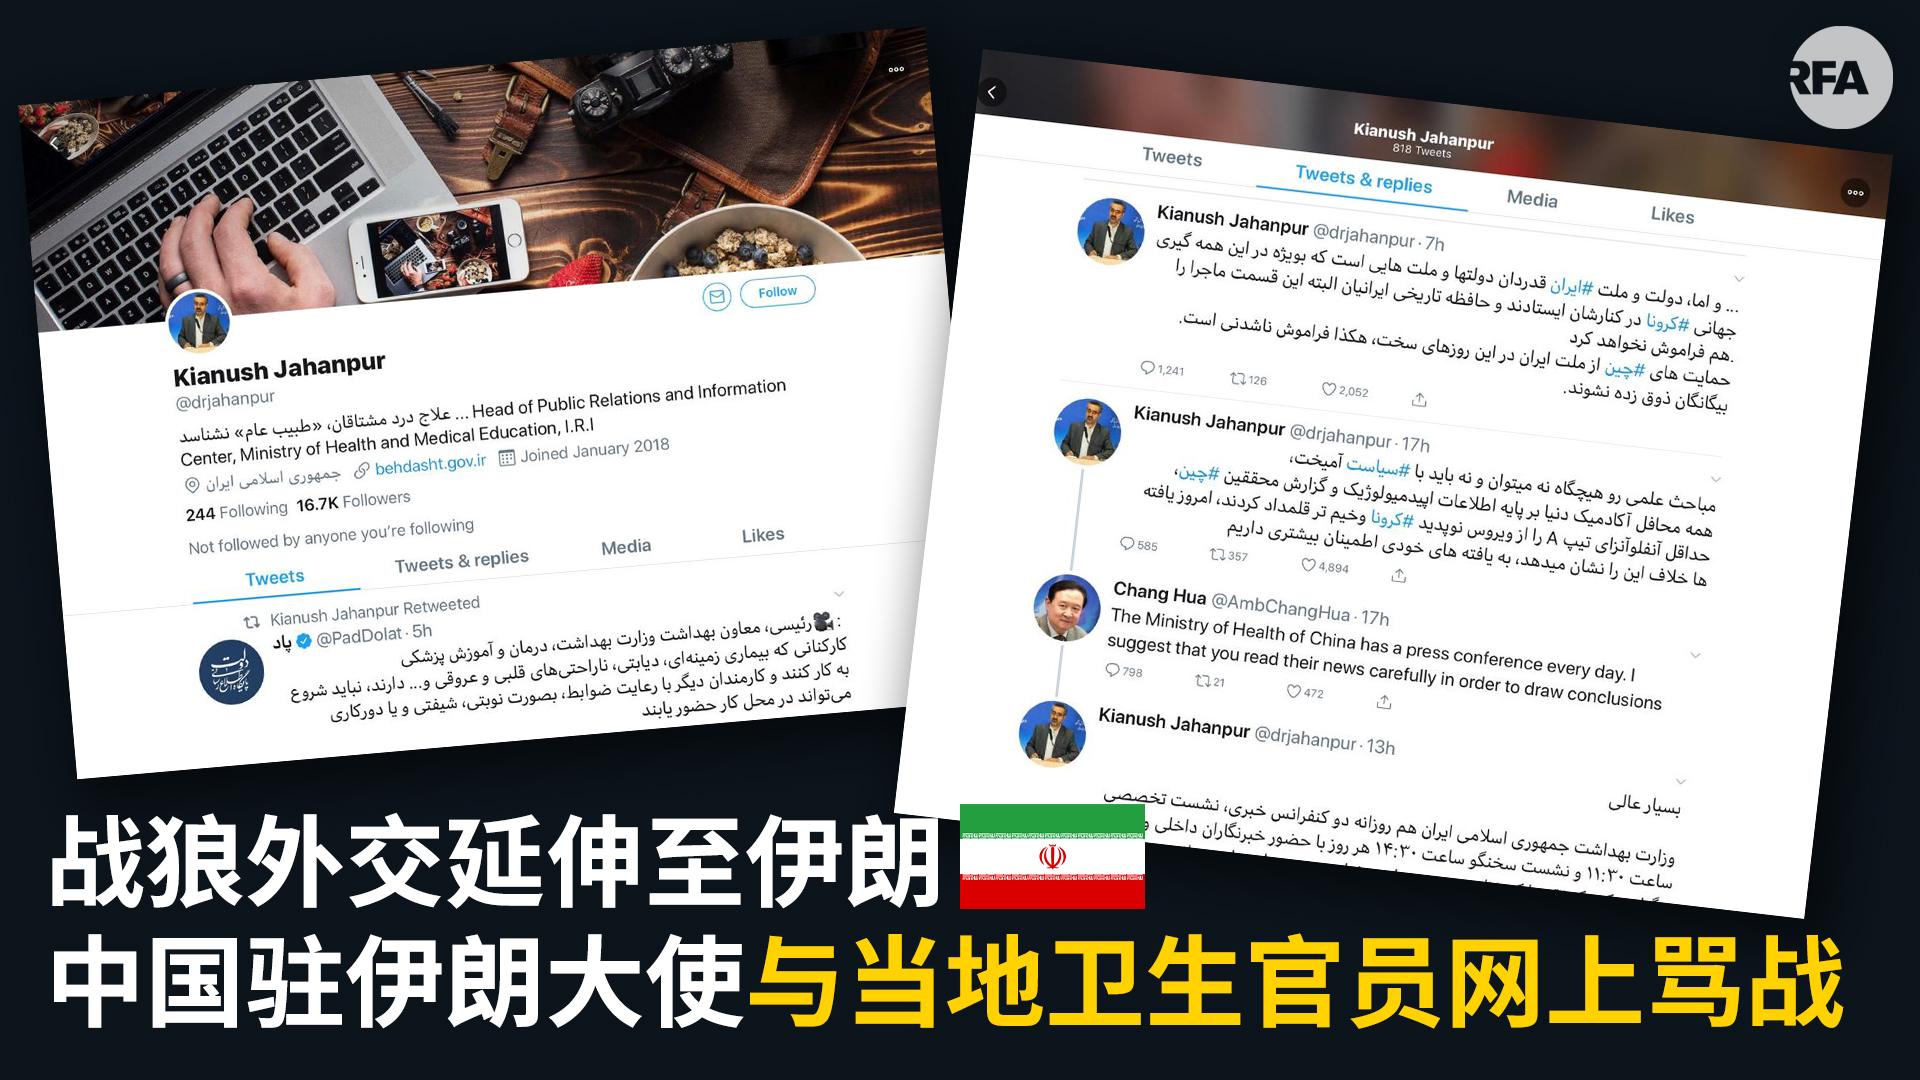 �Z�h普��的言��S即惹来中���v伊朗大使常�A的警告,�p方的�W上�R战一�|即�l。(RFA)